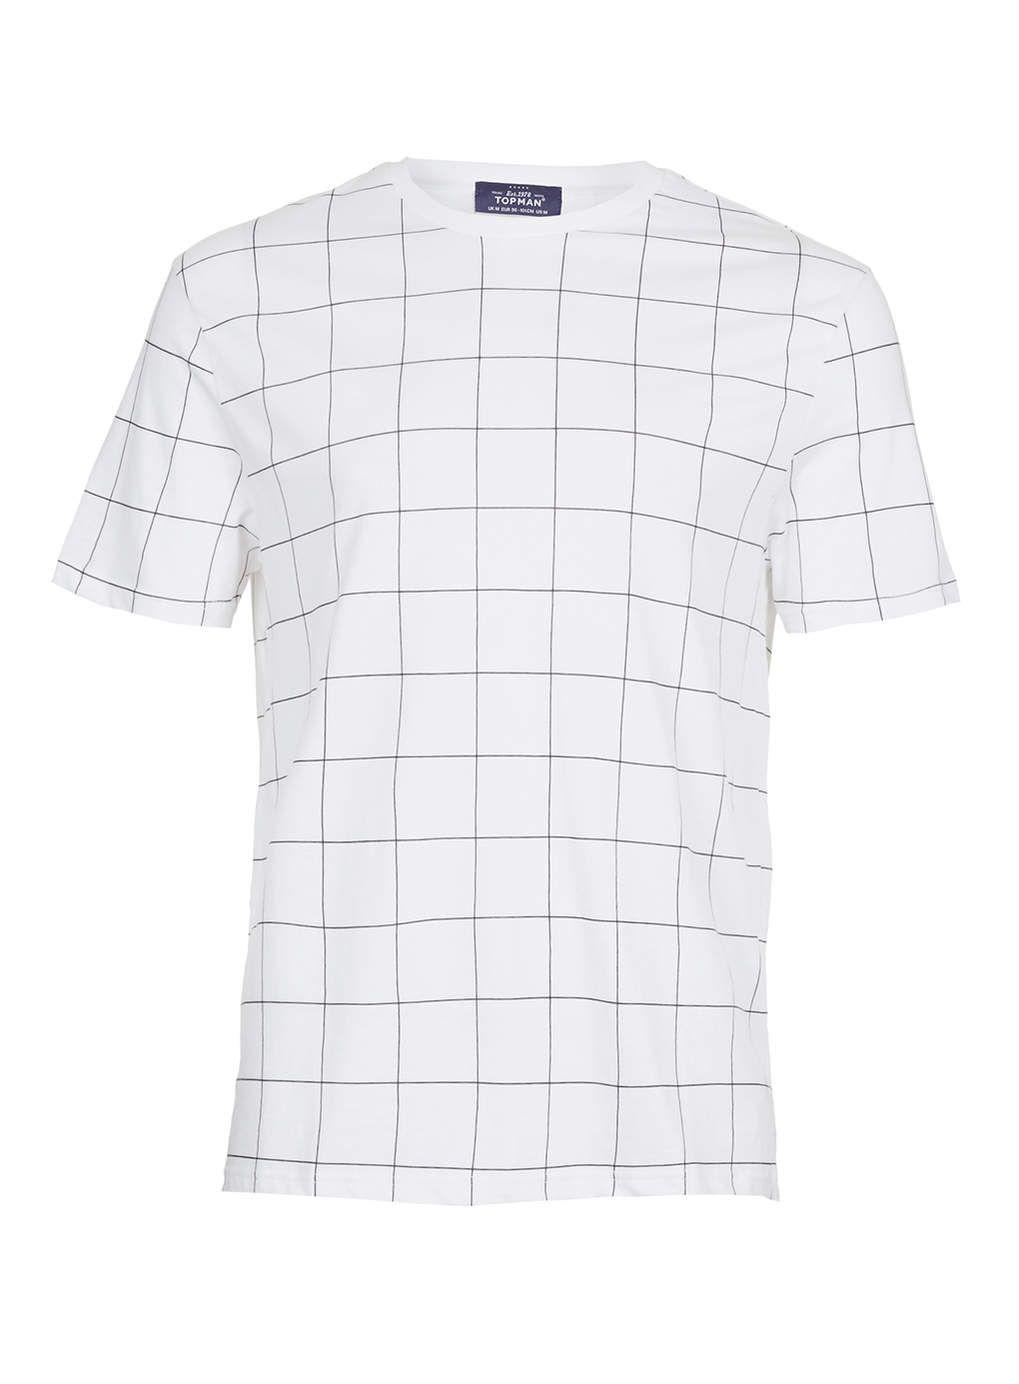 Black t shirt topman - White Grid Print T Shirt Topman Europe